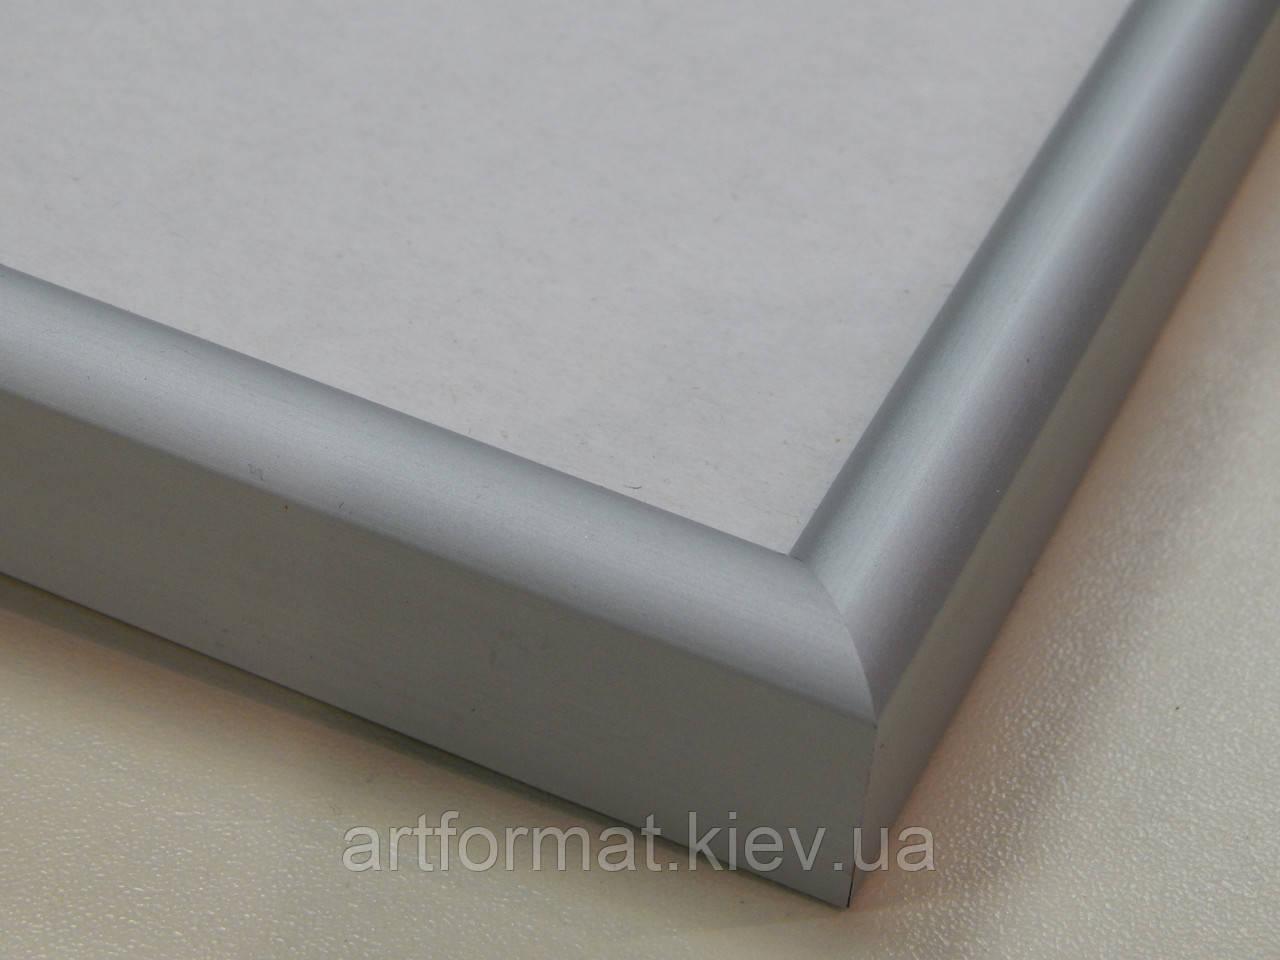 Рамка алюминиевая А2 (420х594).Серебро (металлик).Профиль 11мм.